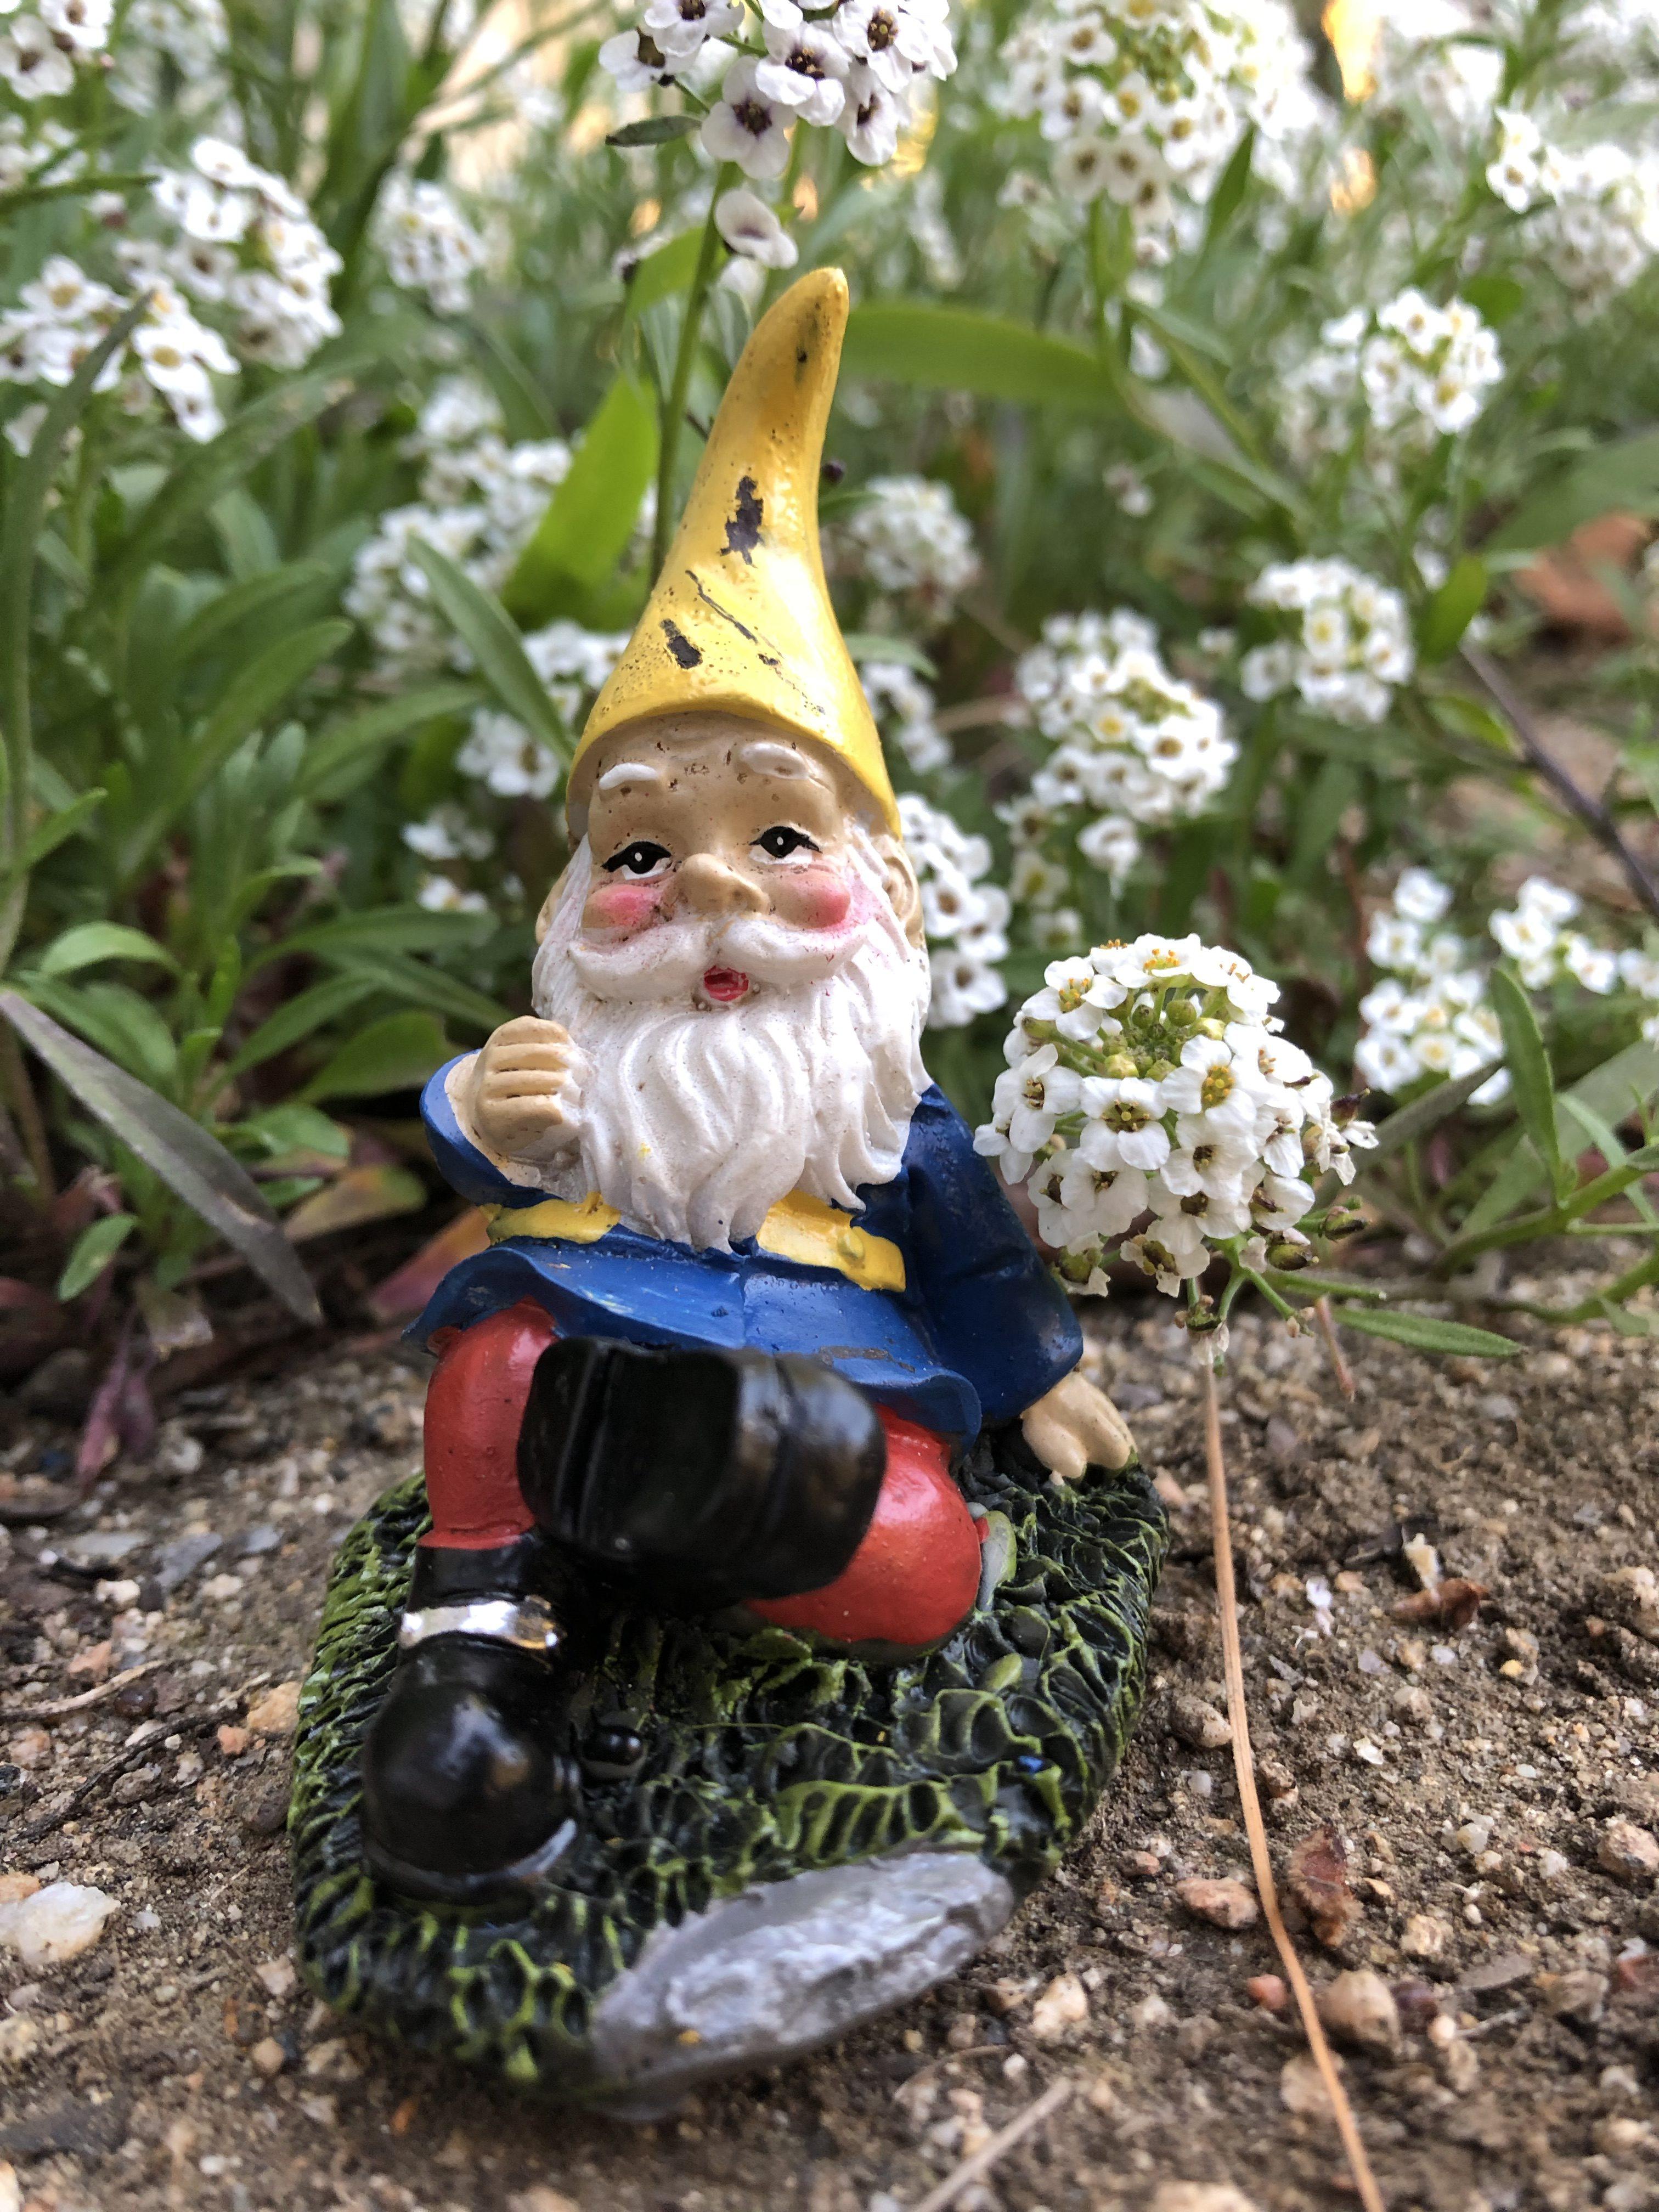 Seated Garden Gnome